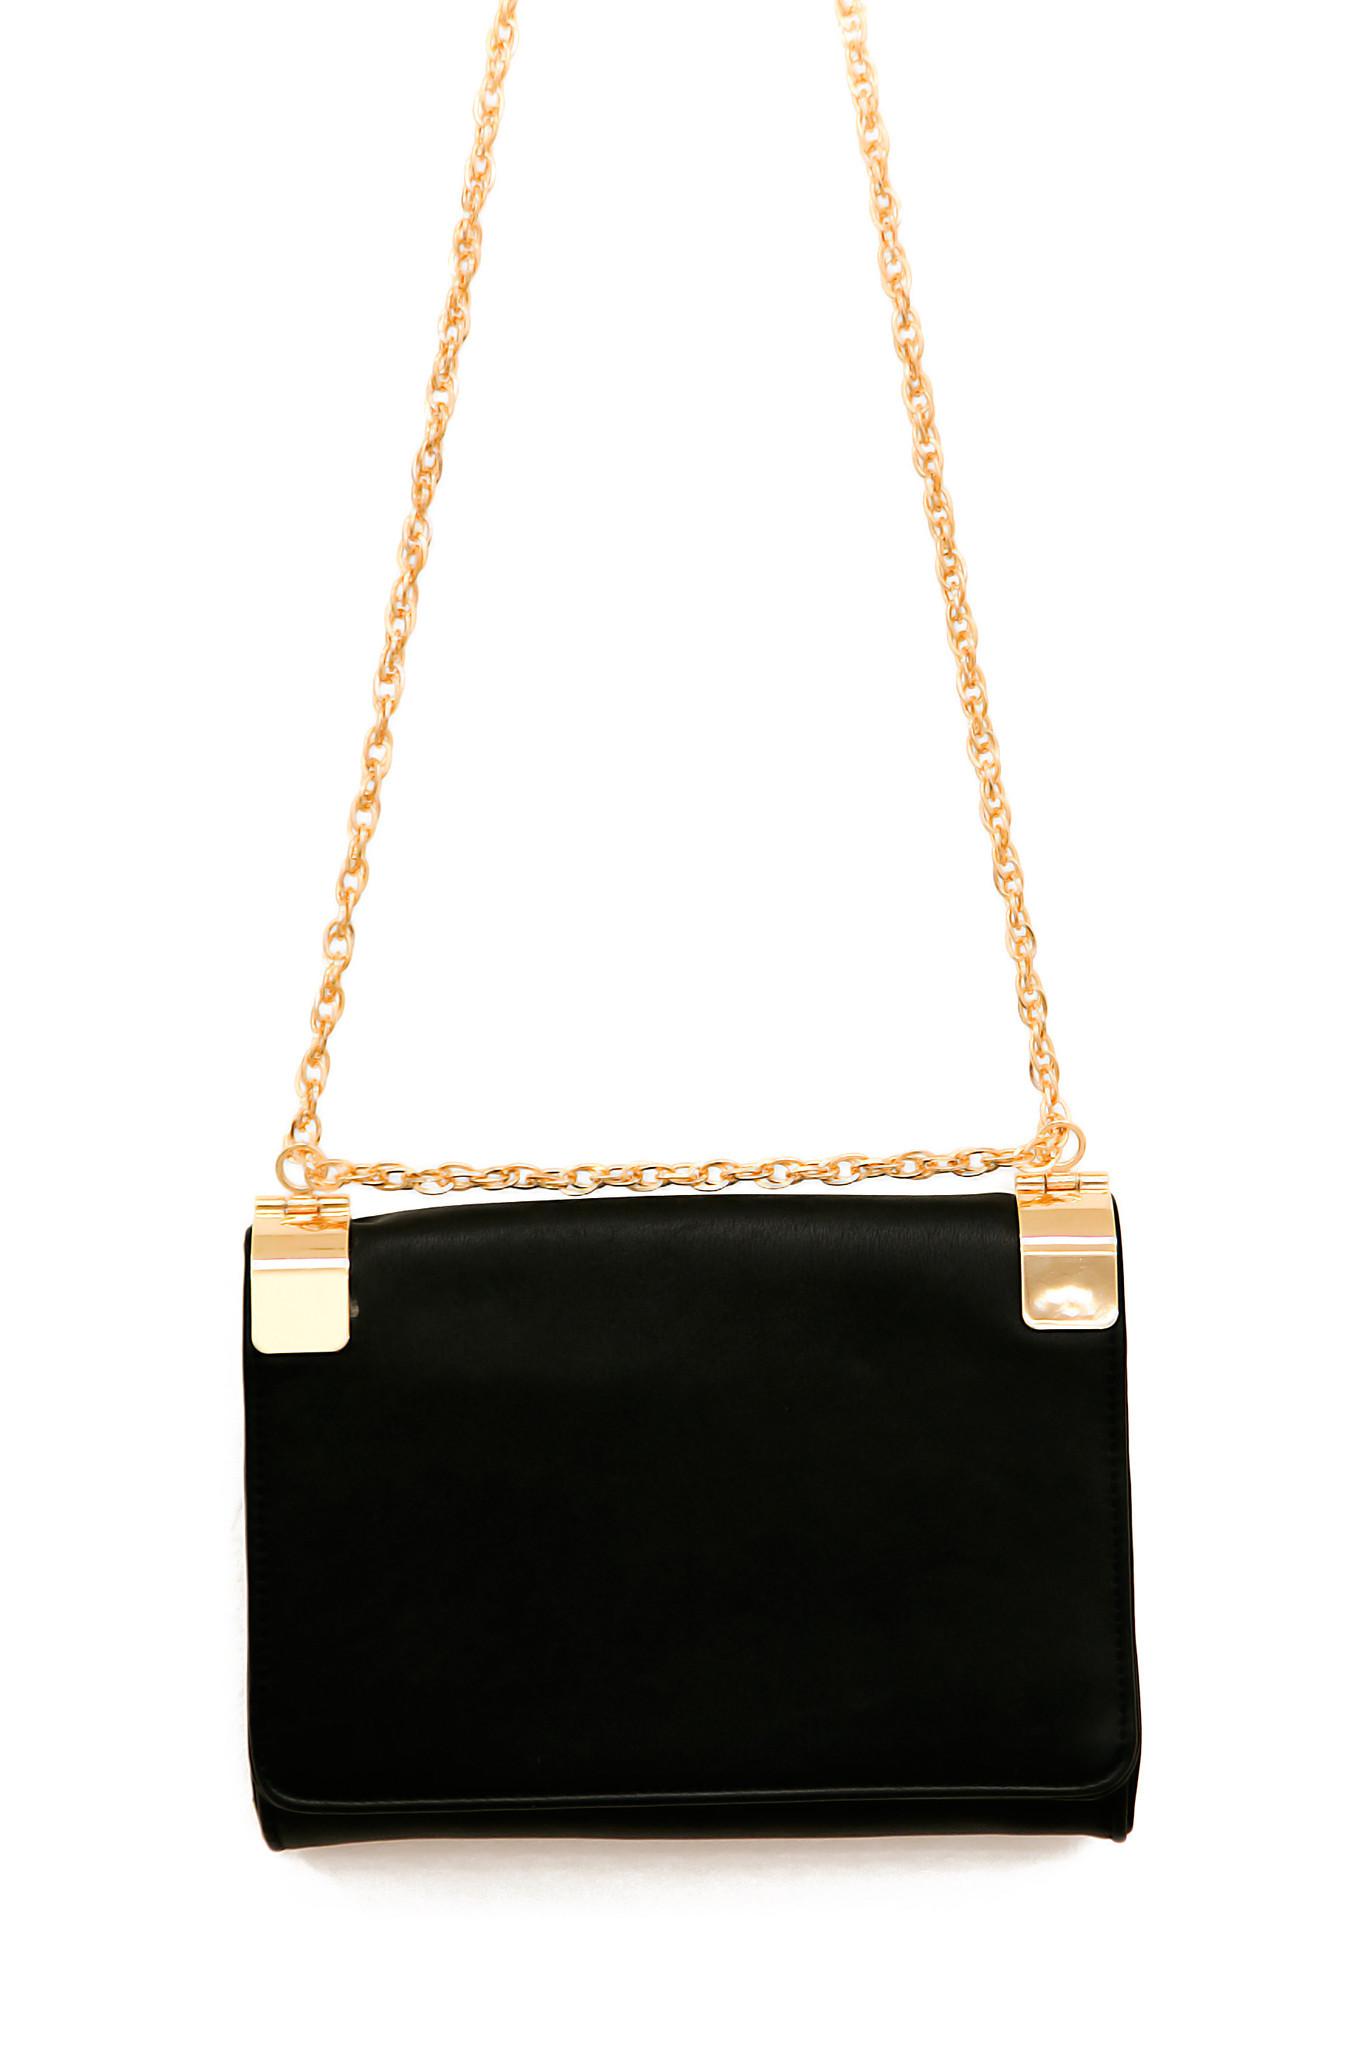 Alexander crossbody bag